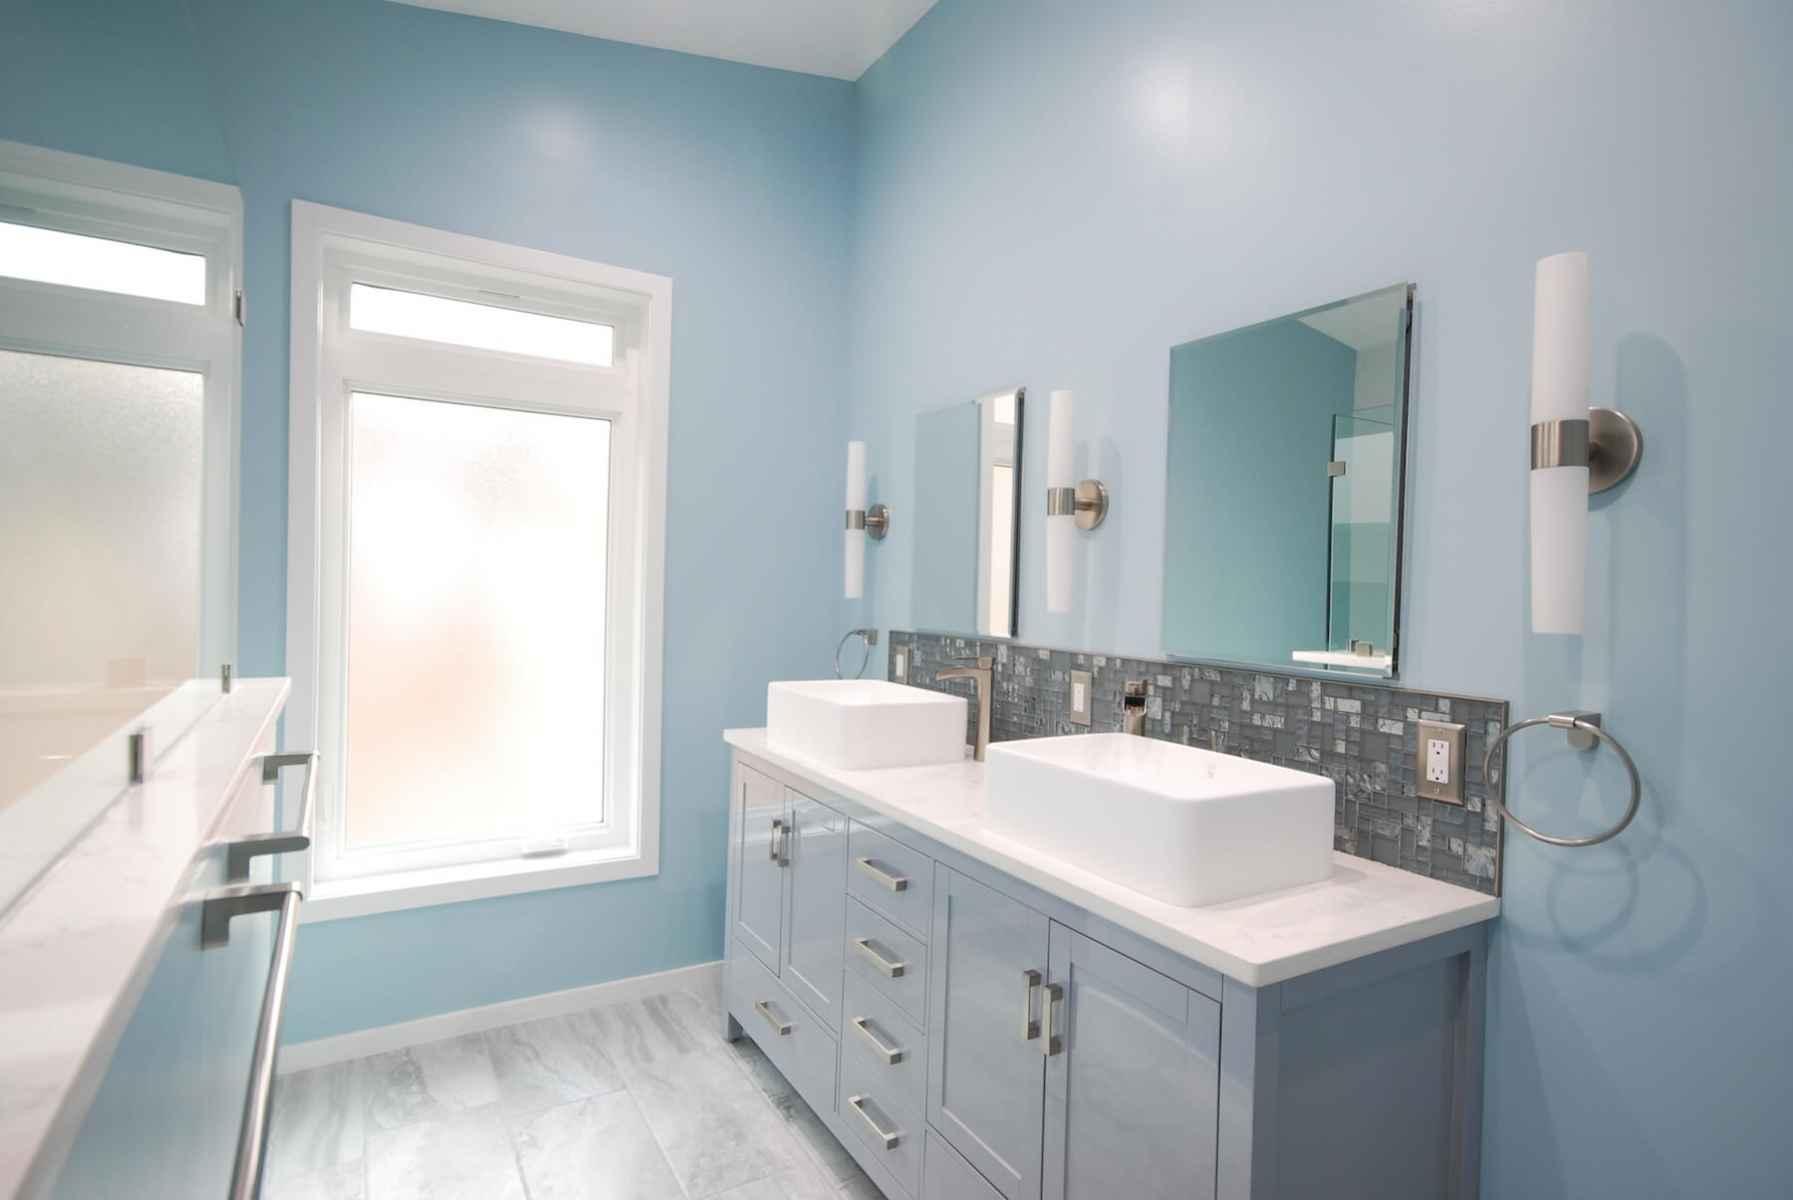 bathroomadd_8514-1-2